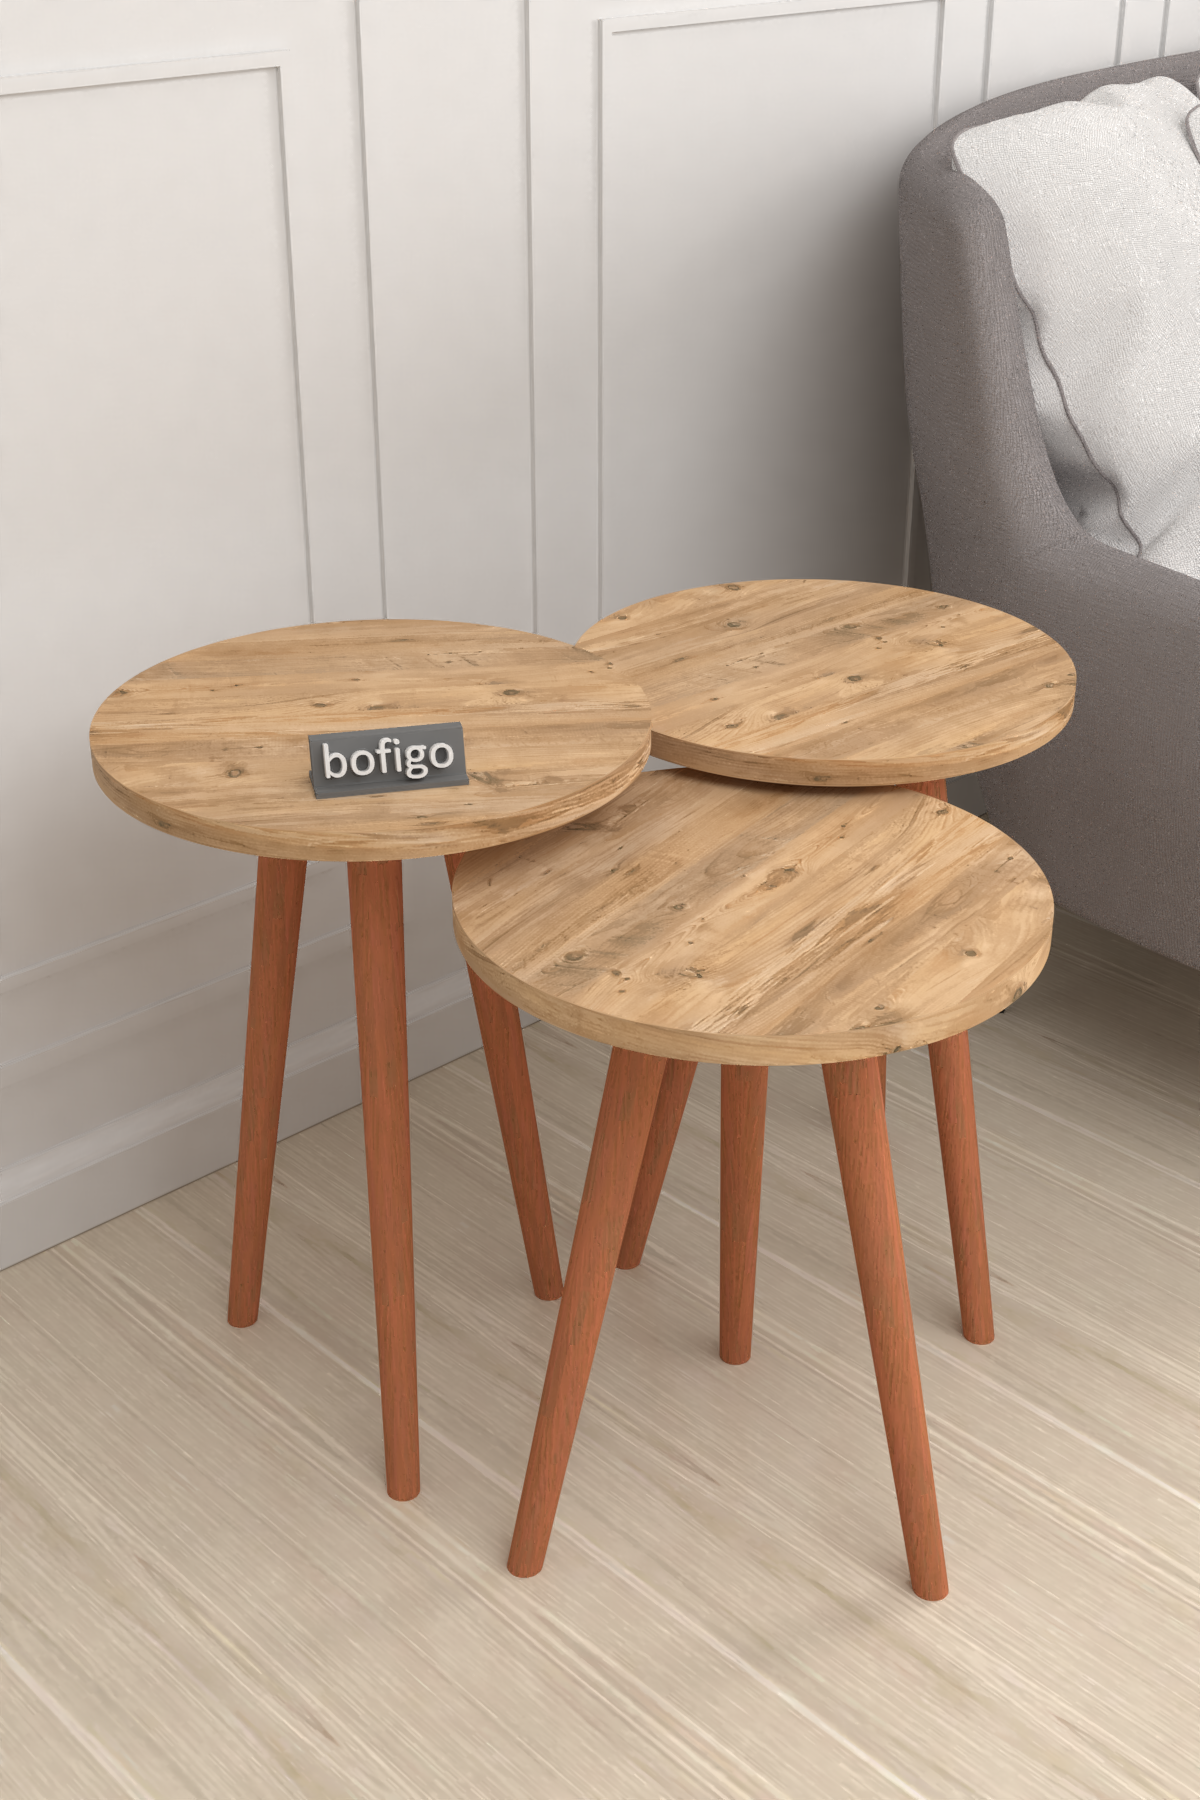 Bofigo Wooden Leg Nesting Table Pine